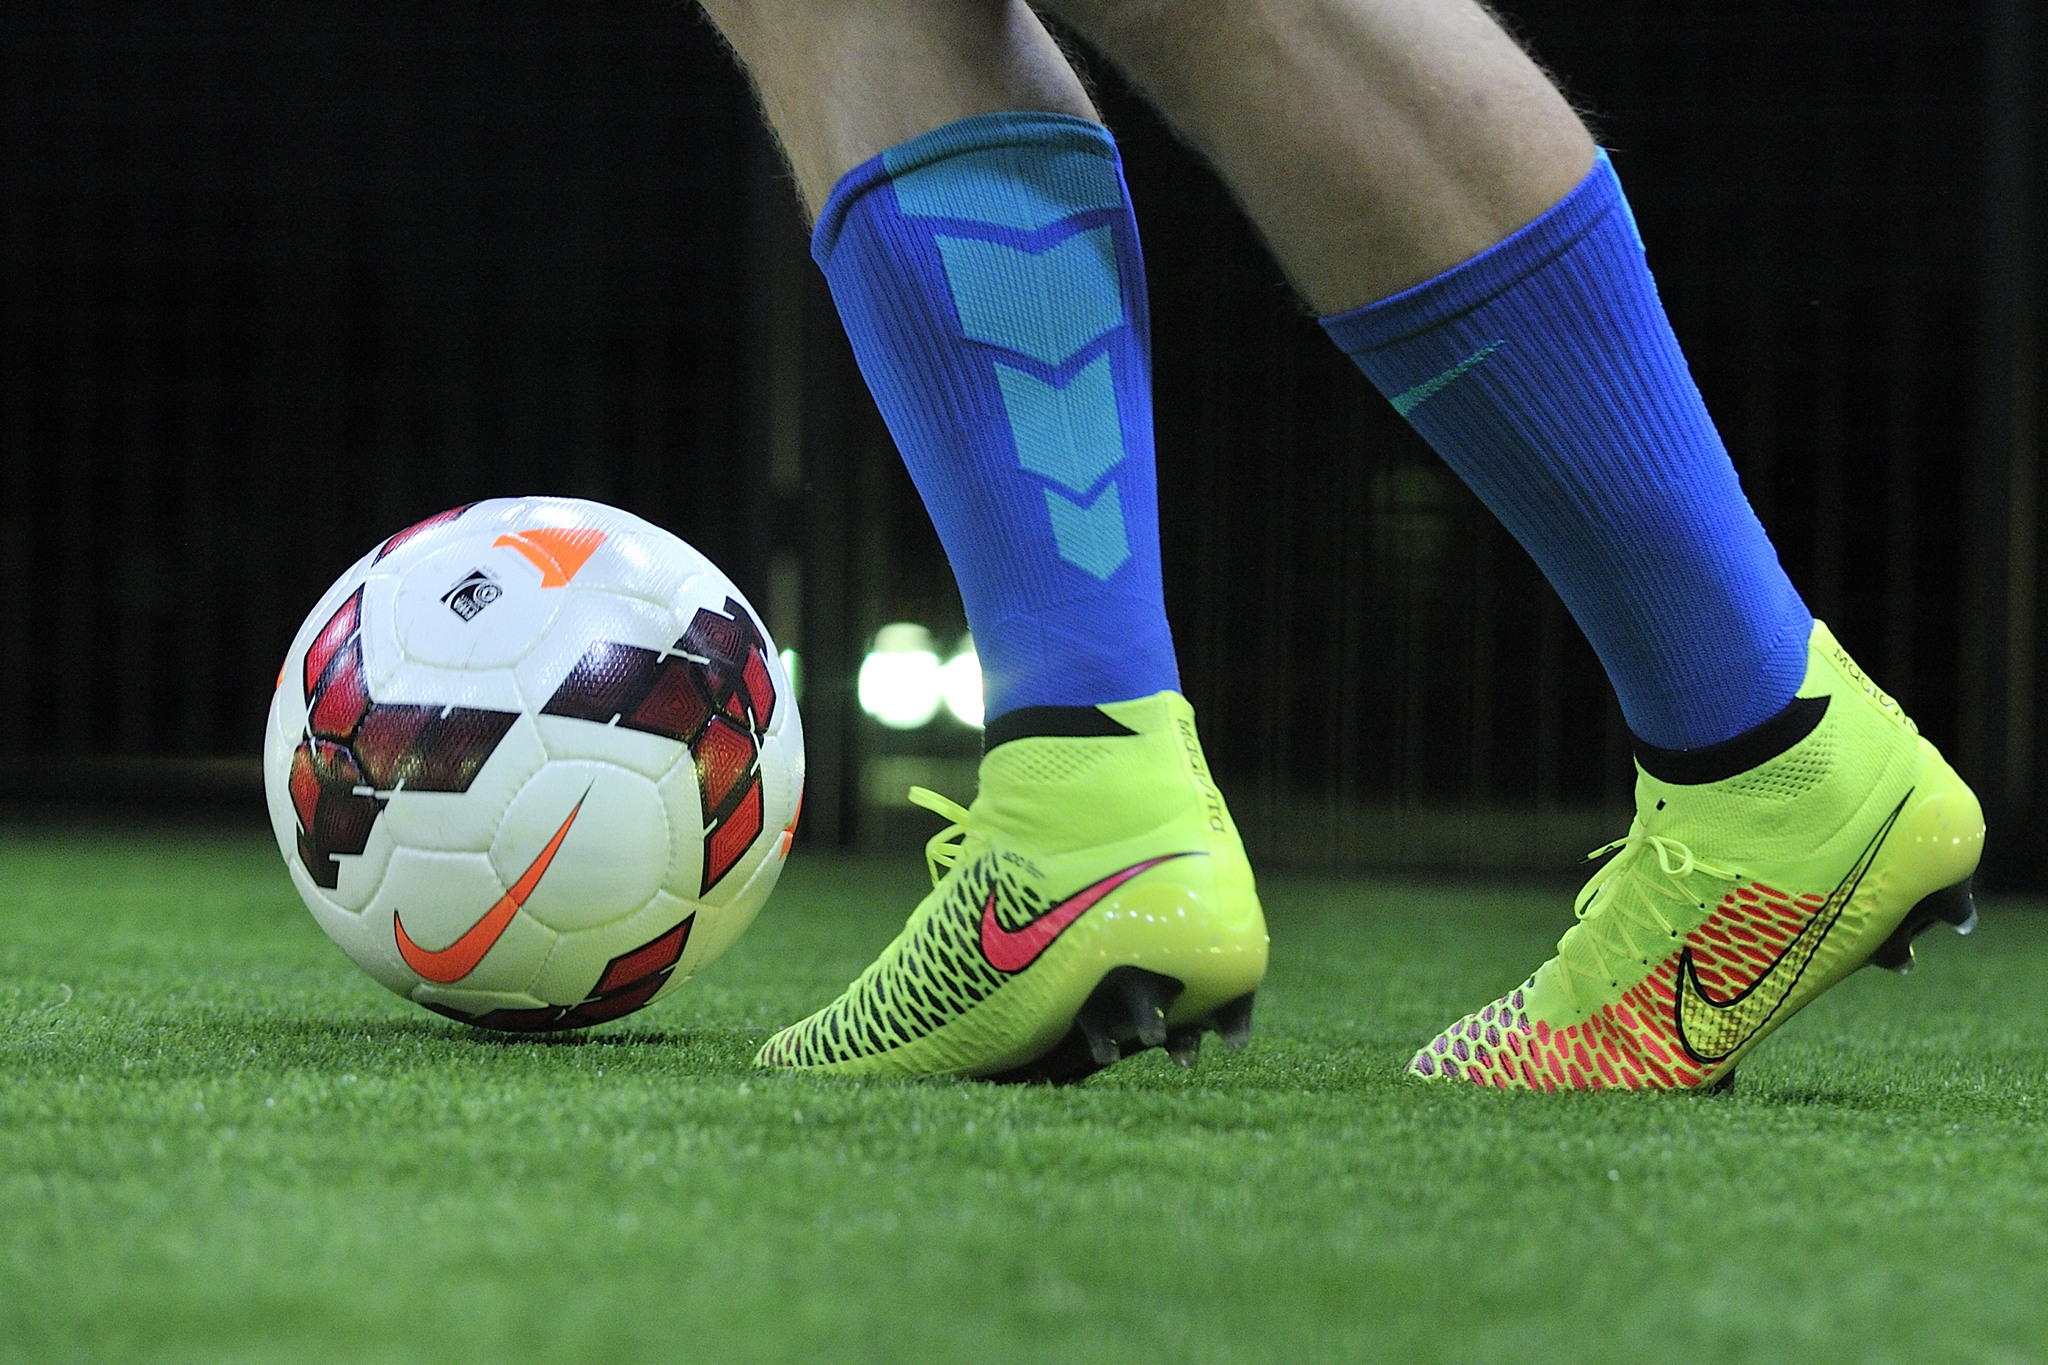 Pelotas y Chimpunes Nike - 2048x1365